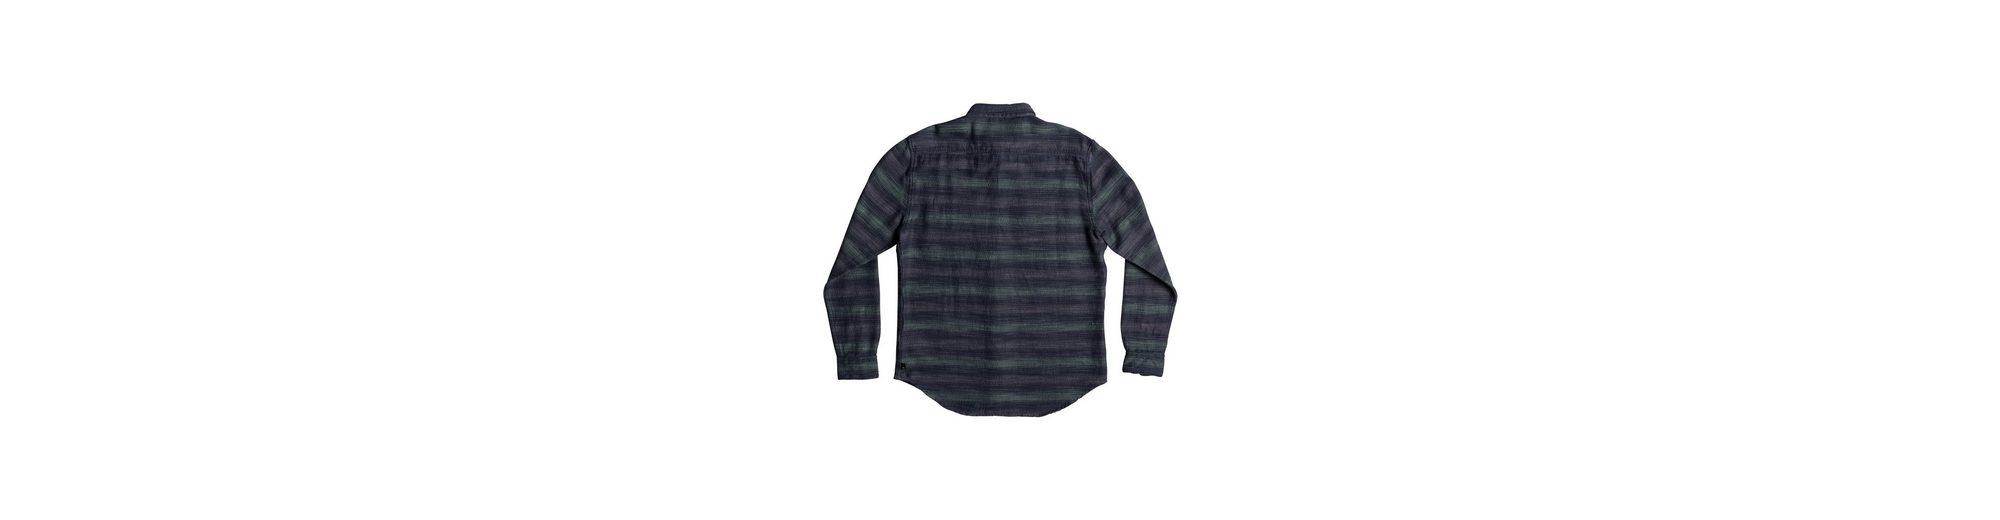 Quiksilver Langarm-Hemdjacke Dusky Town Flannel Billig Verkauf 2018 Unisex 3uvYEyoHm